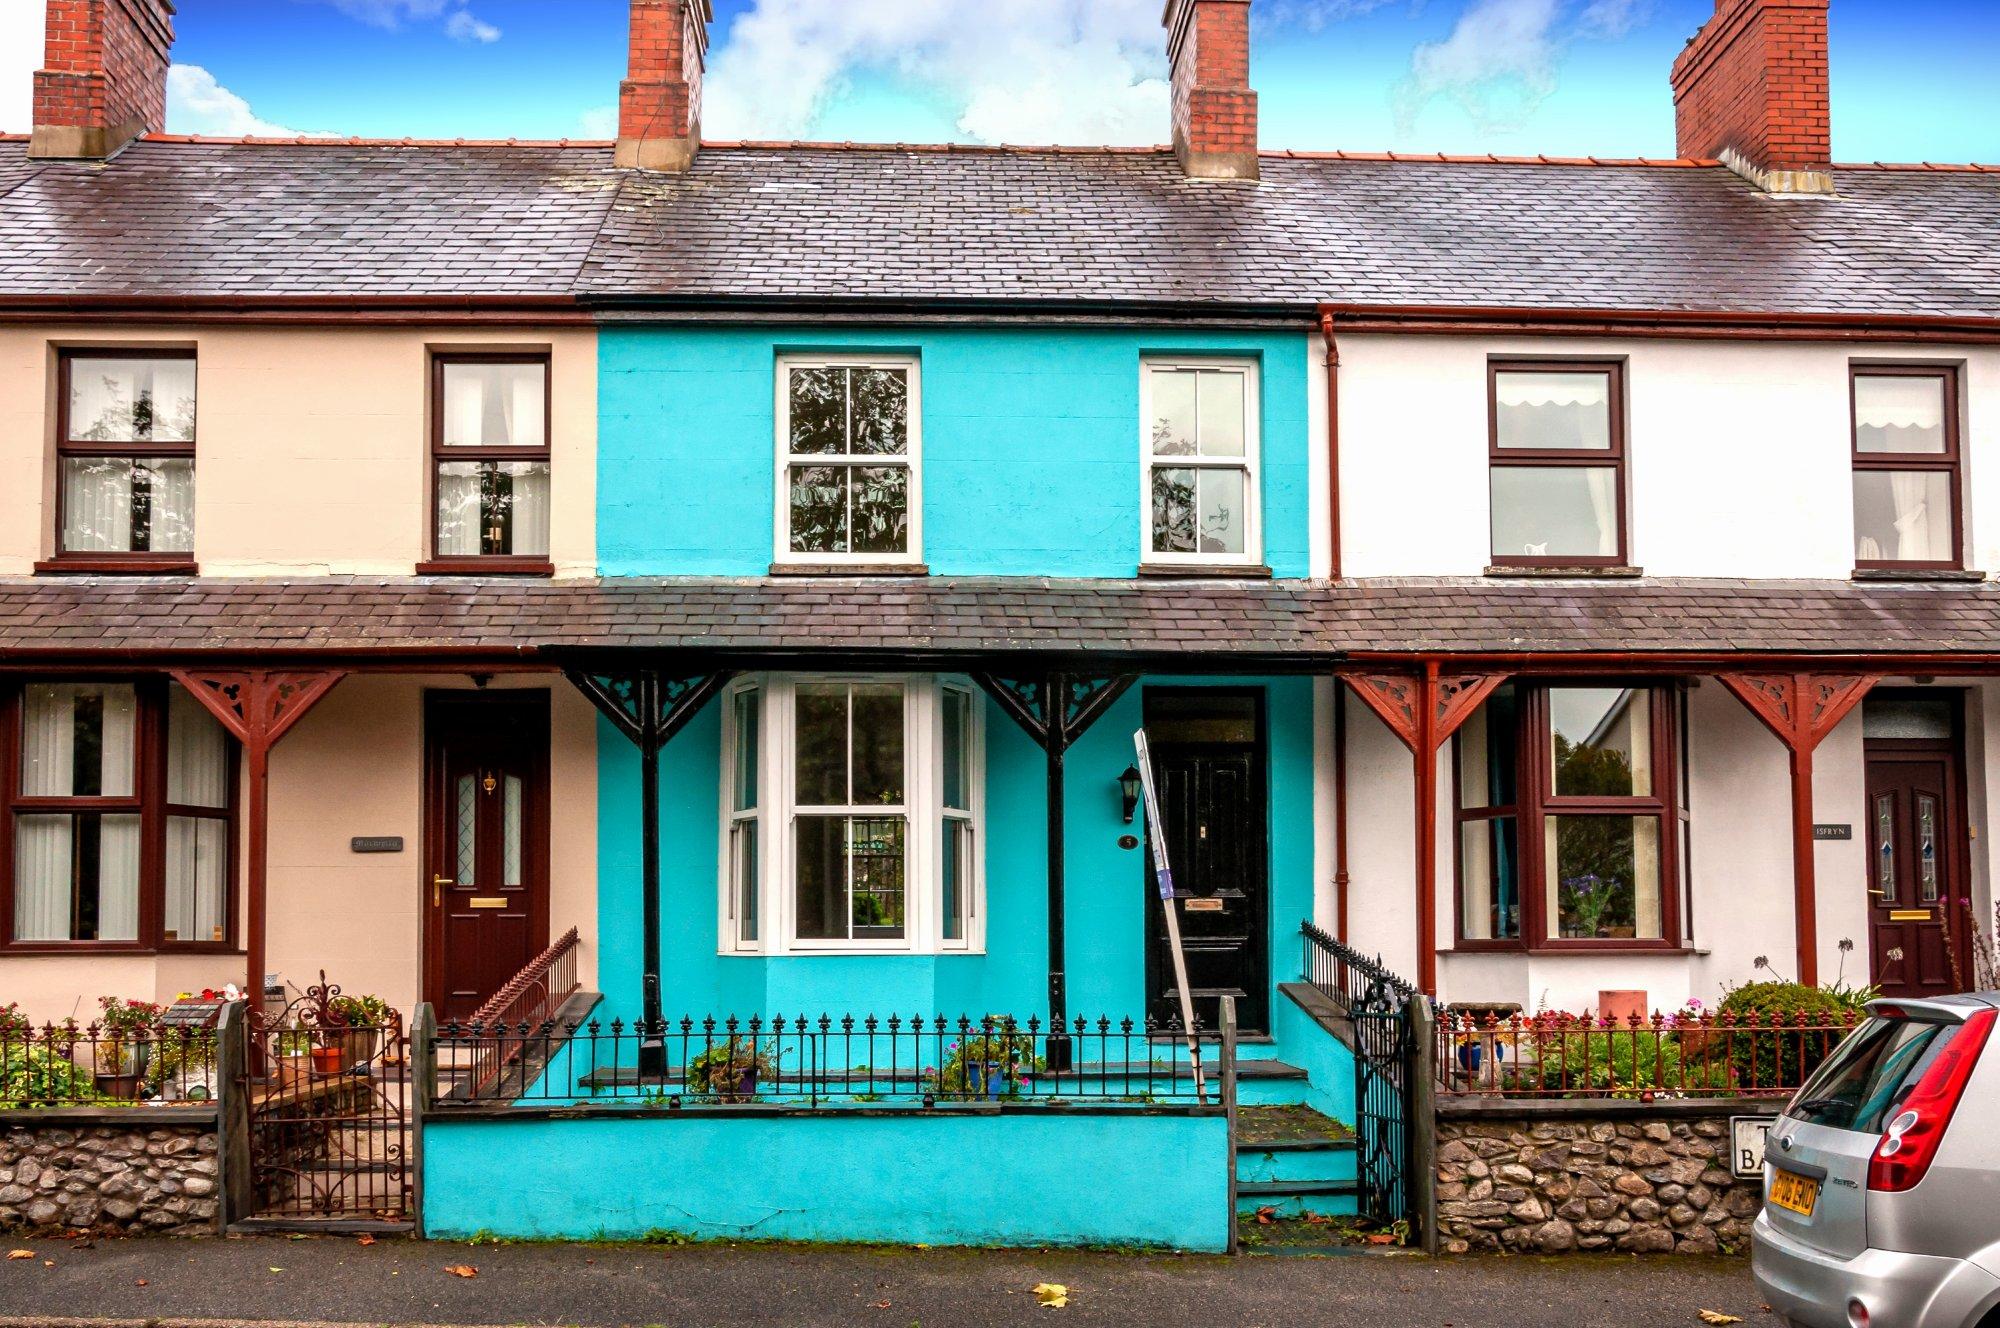 Tai Gwel Y Don, Llanwnda, North Wales